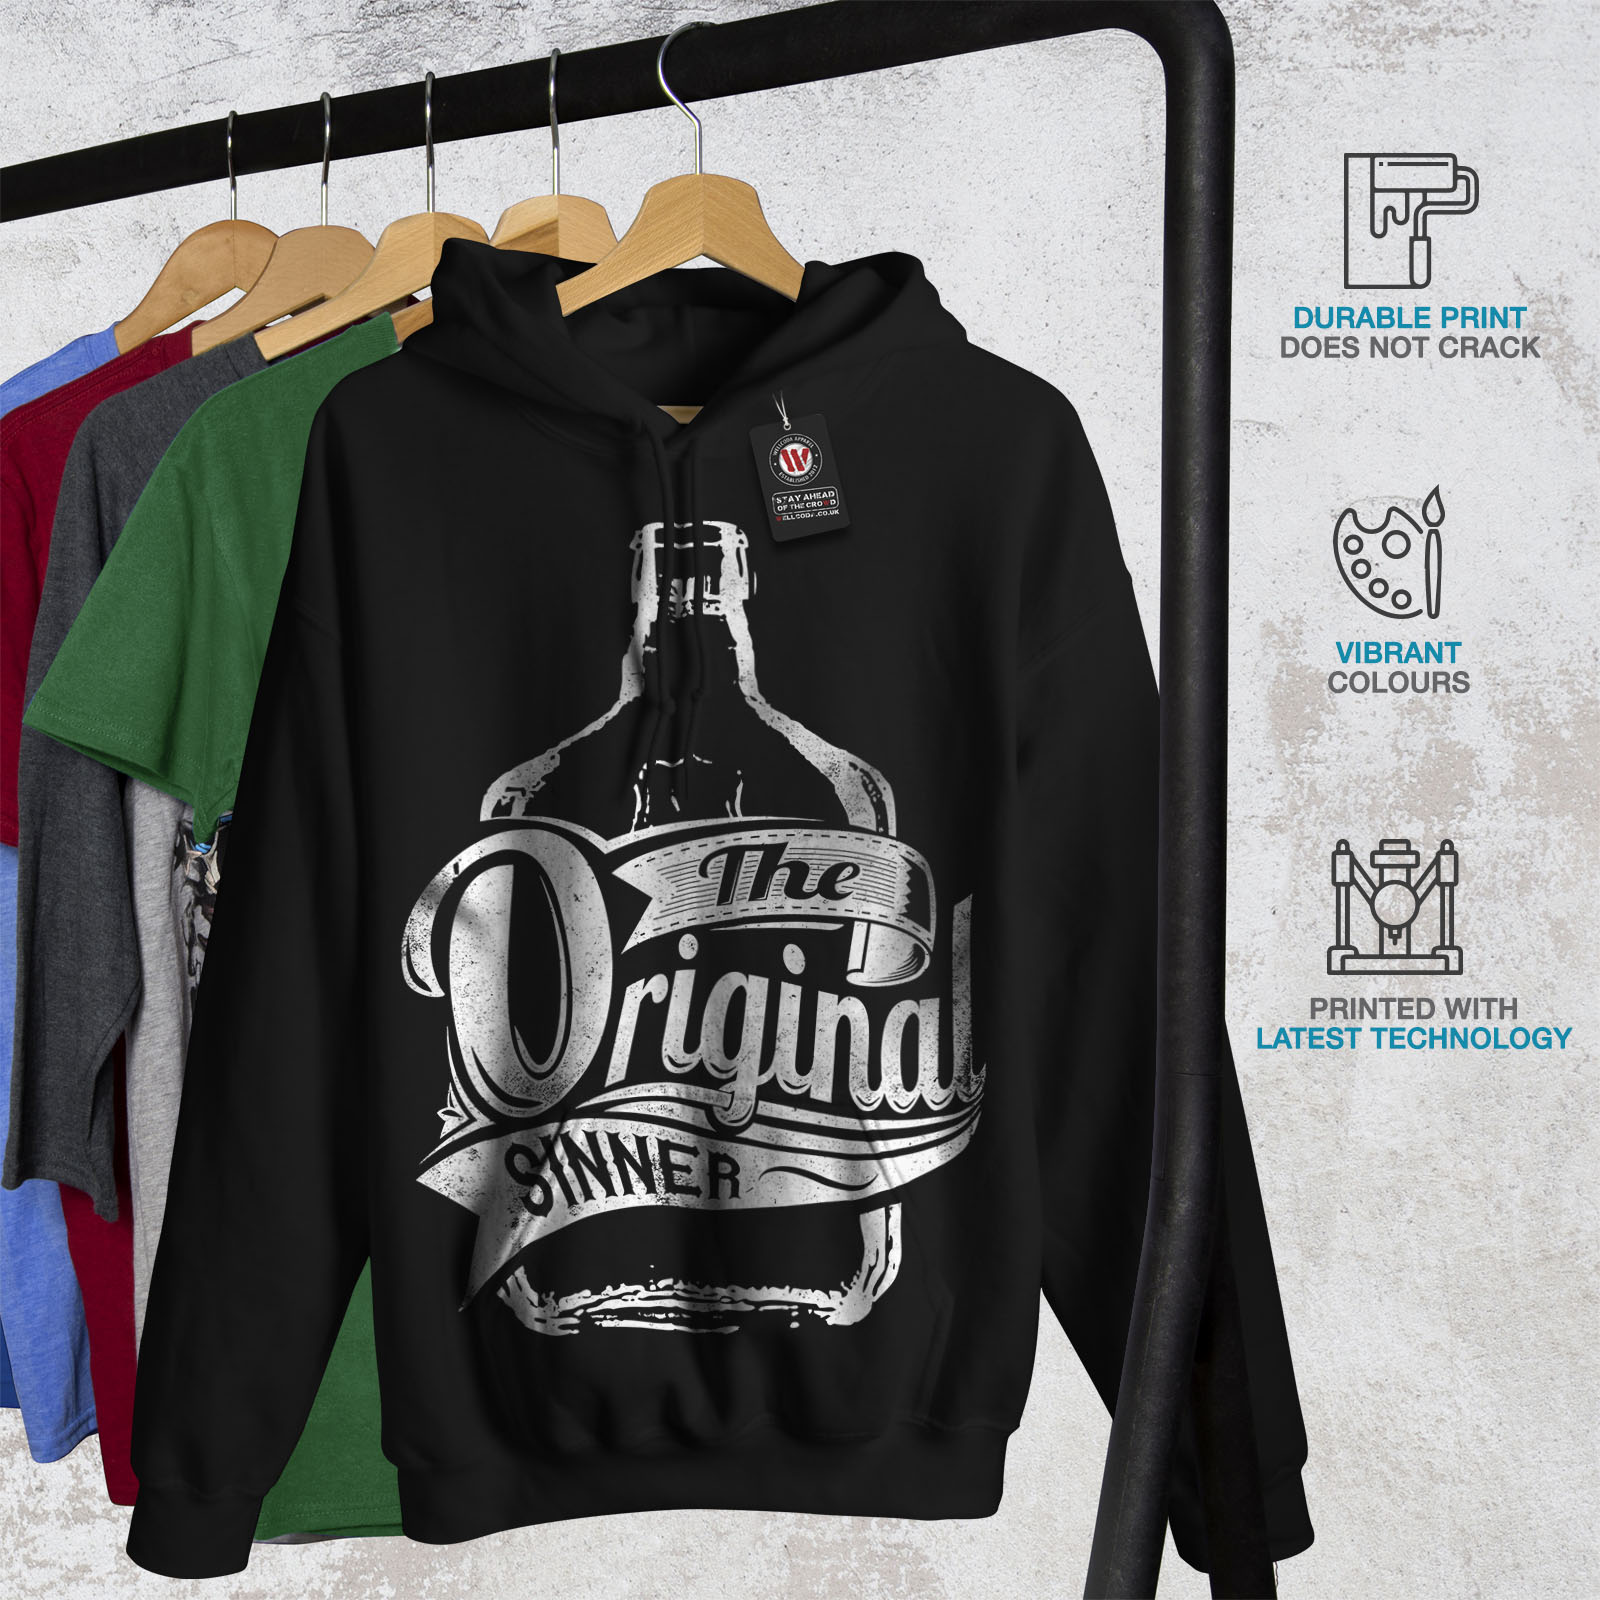 Wellcoda-Unique-Sinner-Funny-Mens-Hoodie-Rum-Casual-Hooded-Sweatshirt thumbnail 7